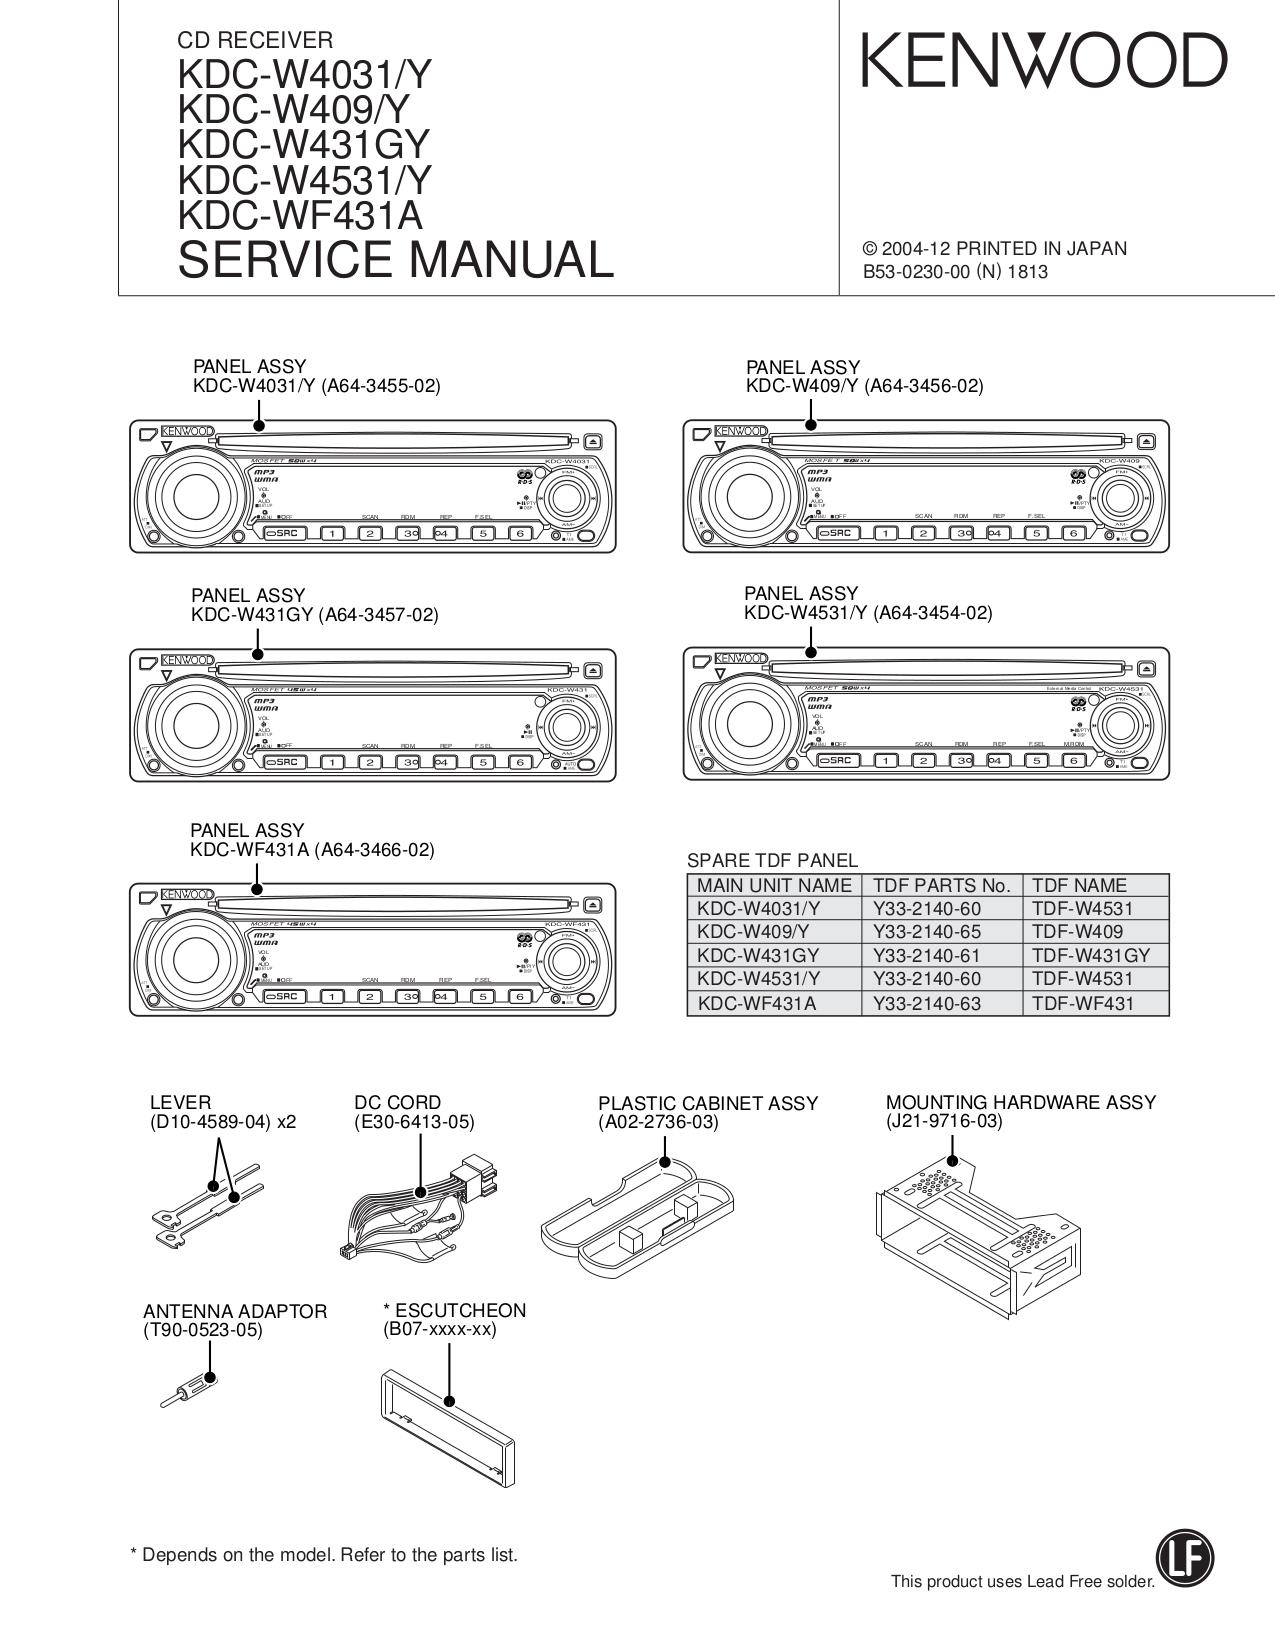 kenwood kdc x494 wiring diagram stereo wiring diagram kenwood kdc x559 guns www thedotproject co  stereo wiring diagram kenwood kdc x559